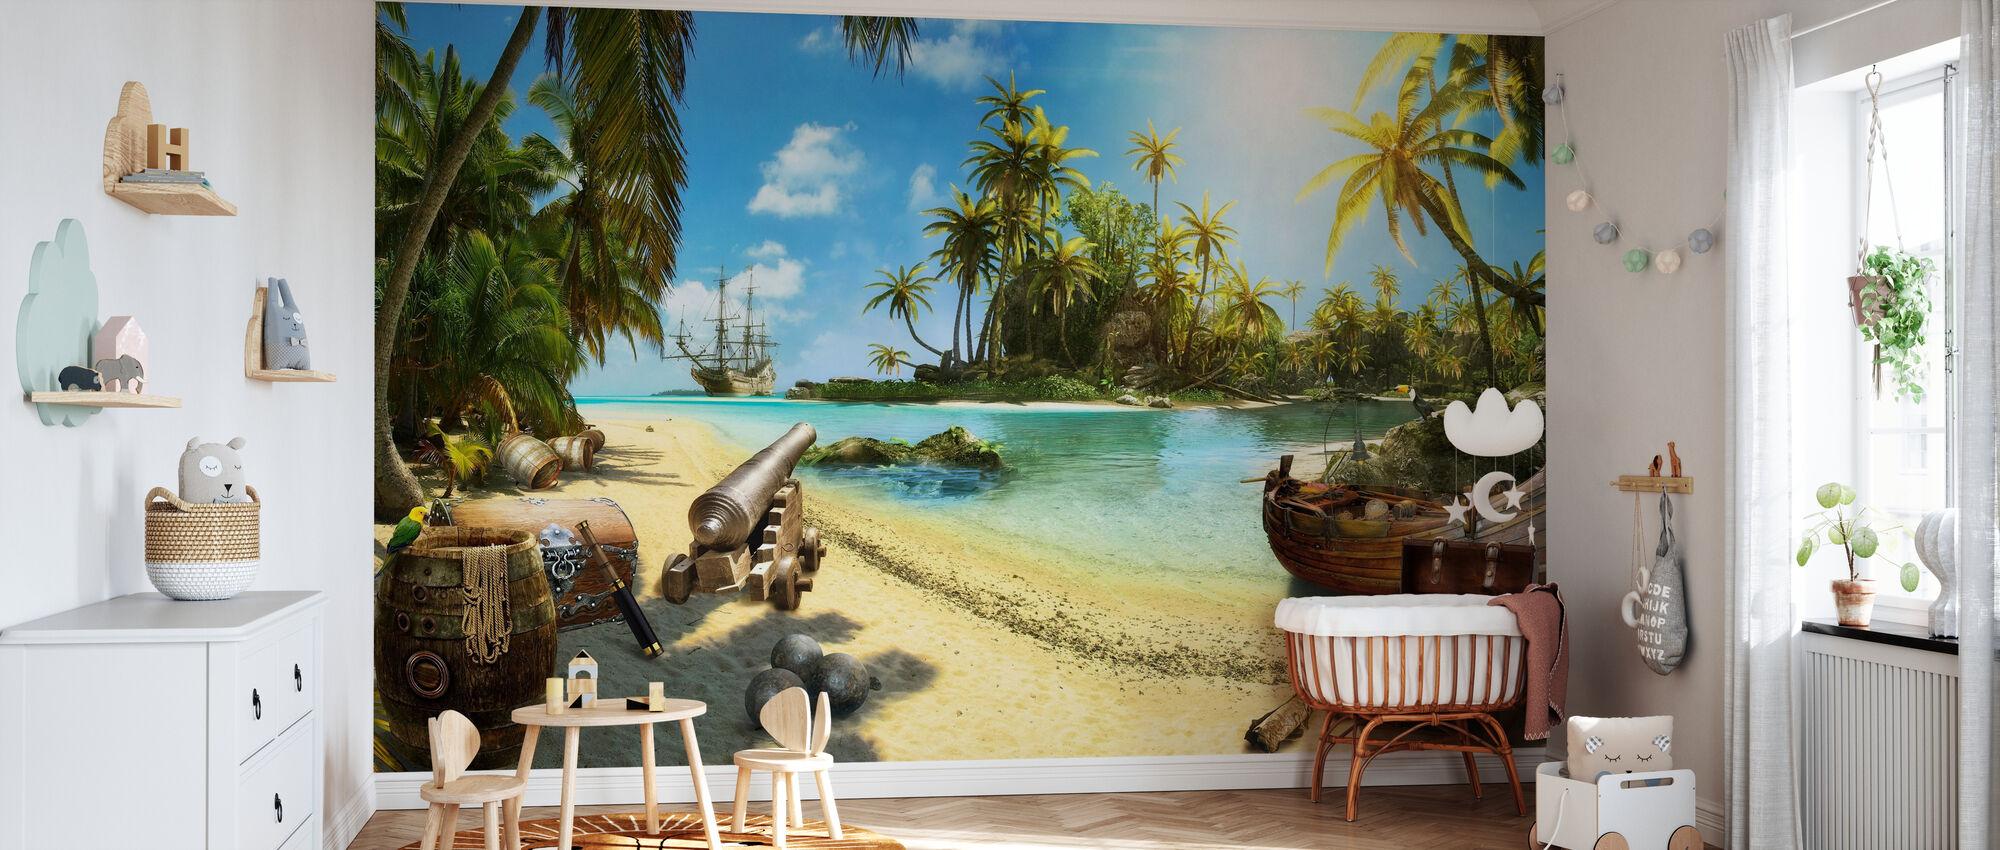 Pirate Island - Tapet - Babyrum